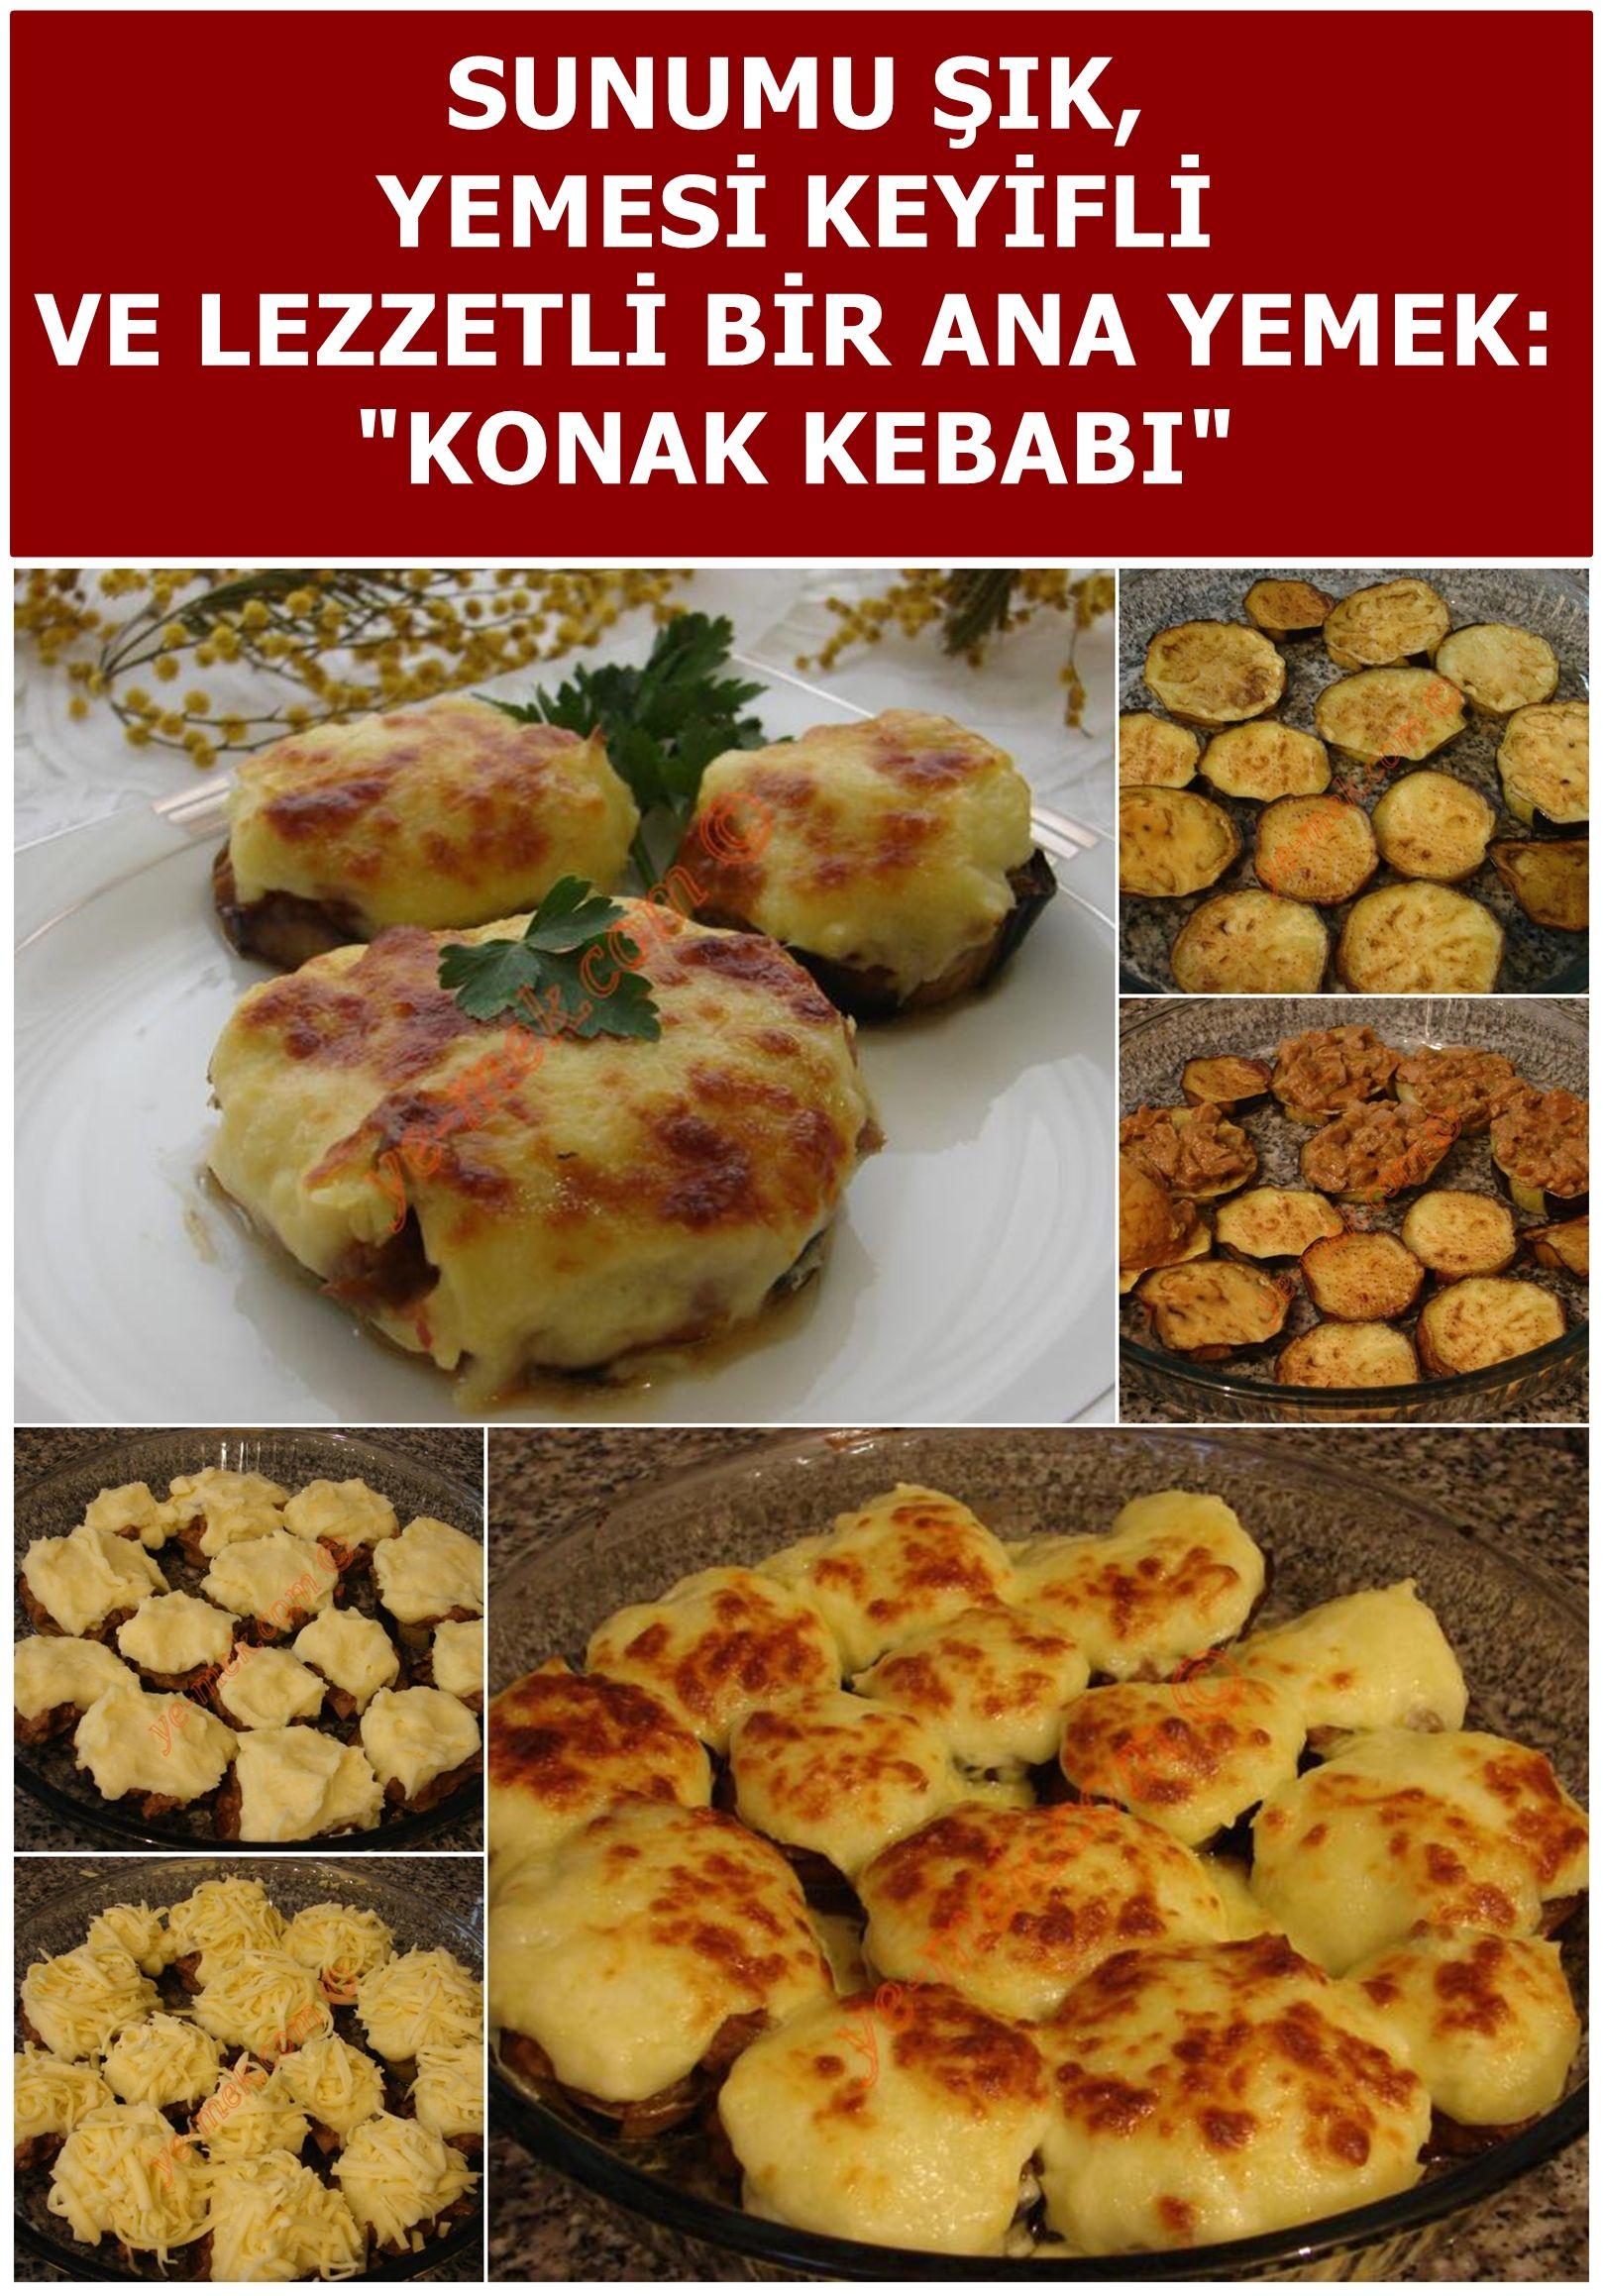 Photo of Konak Kebabı Recipe